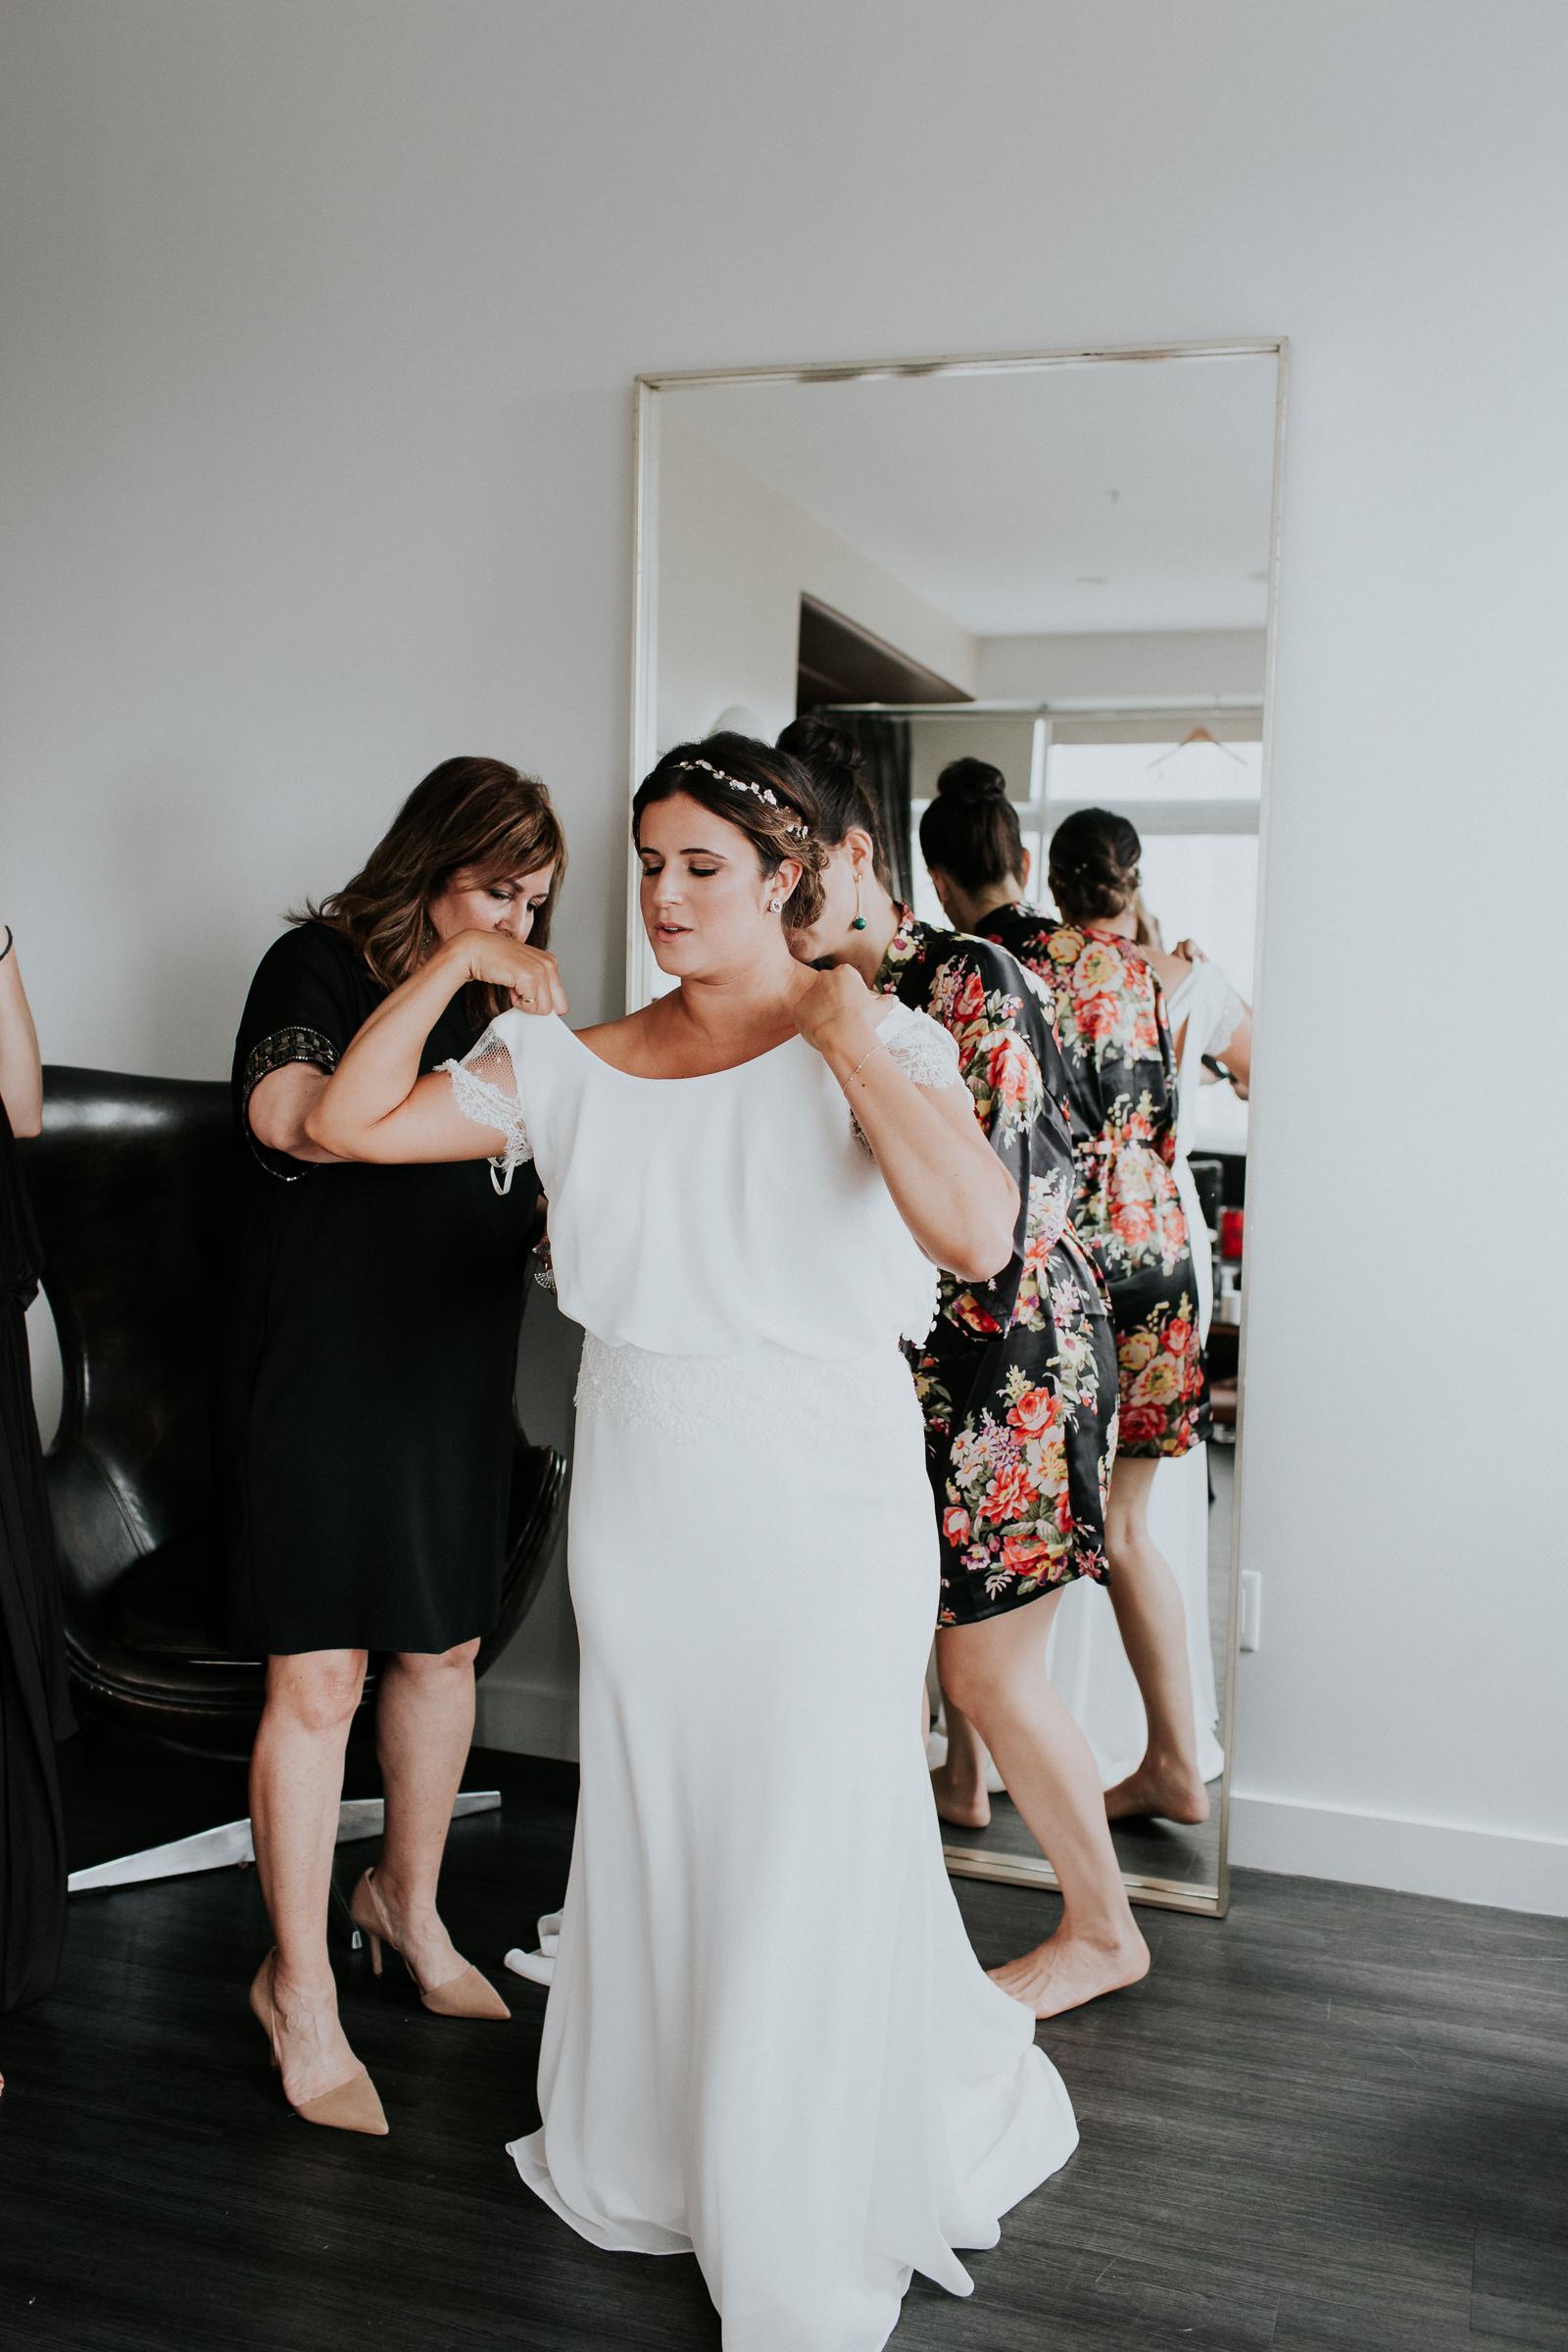 501-Union-Brooklyn-Fine-Art-Documentary-Wedding-Photographer-15.jpg